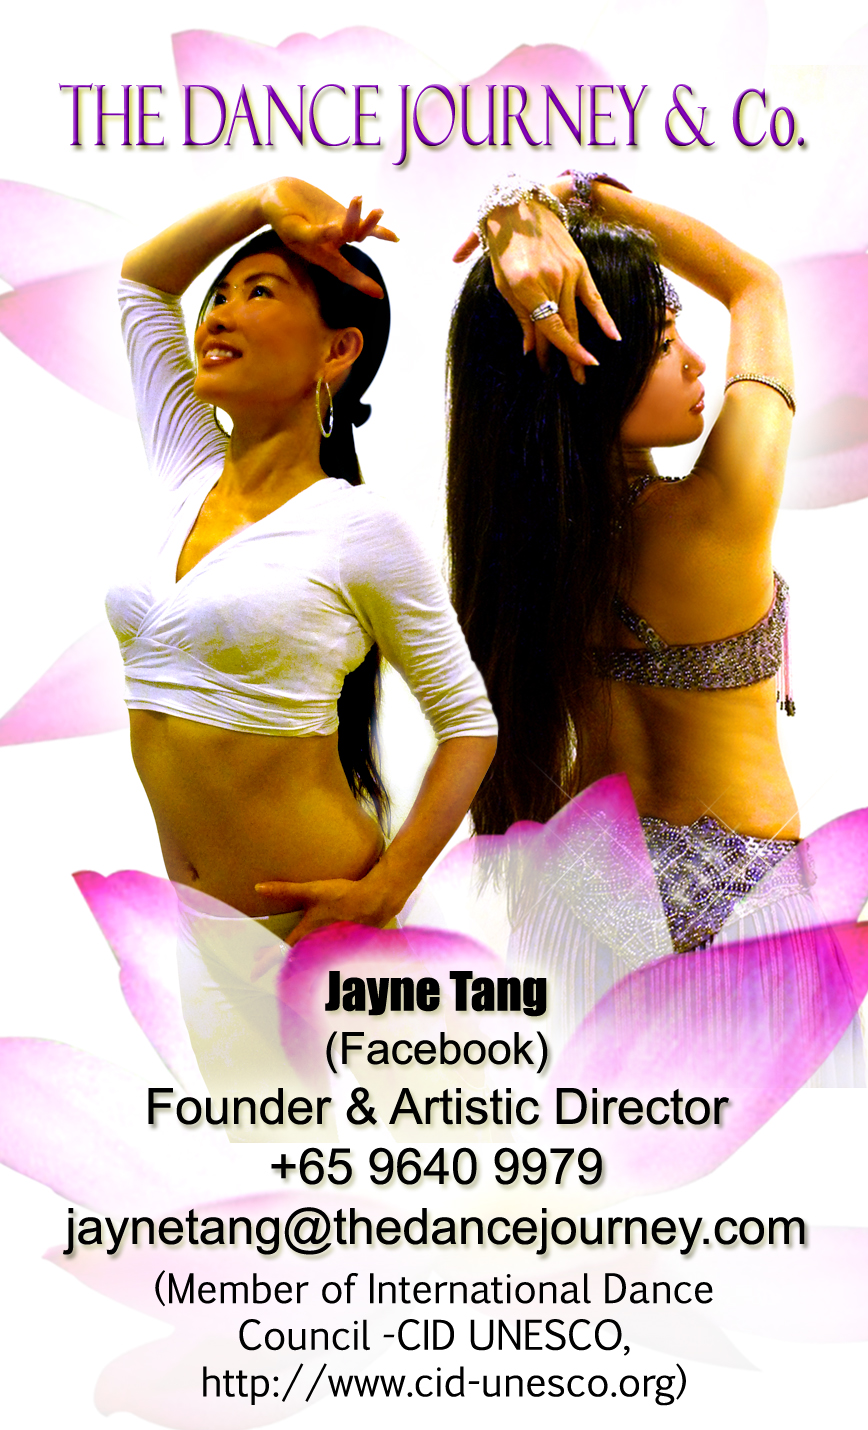 Travel, Dance, Love & Light Experience - Apr' 2011 - in Hong Kong